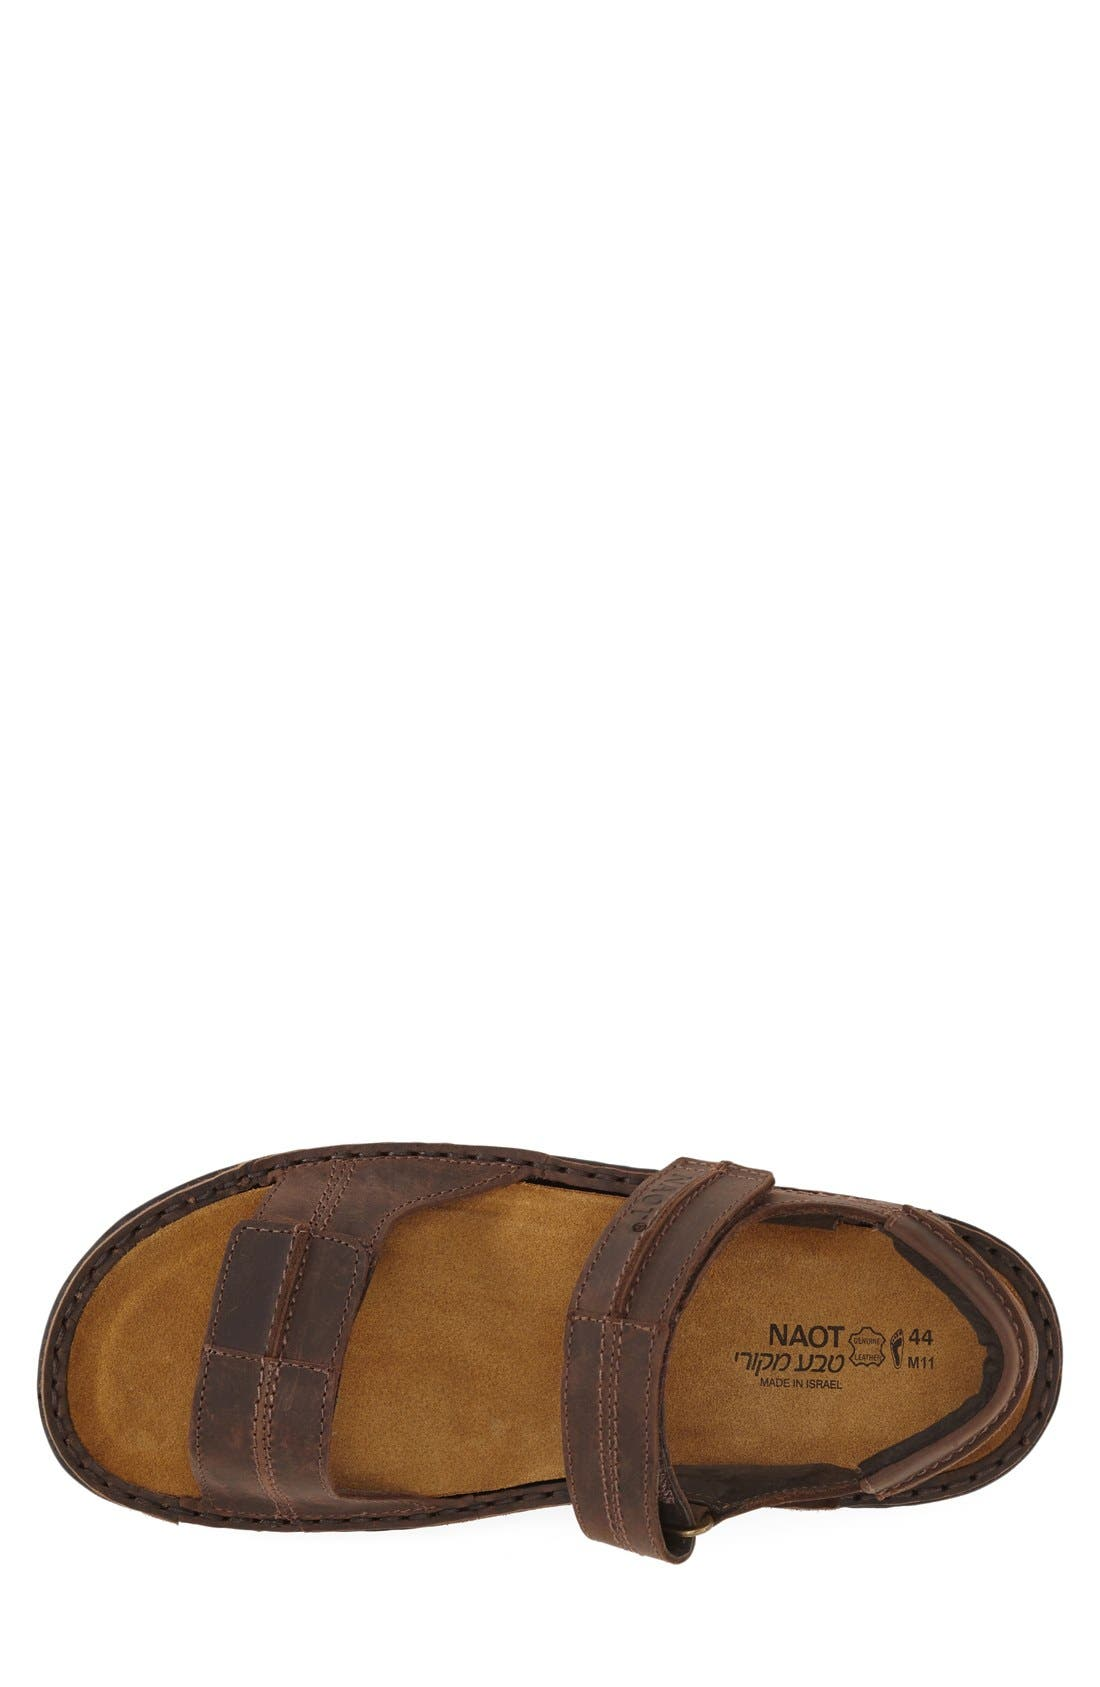 Balkan Sandal,                             Alternate thumbnail 3, color,                             Brown Leather